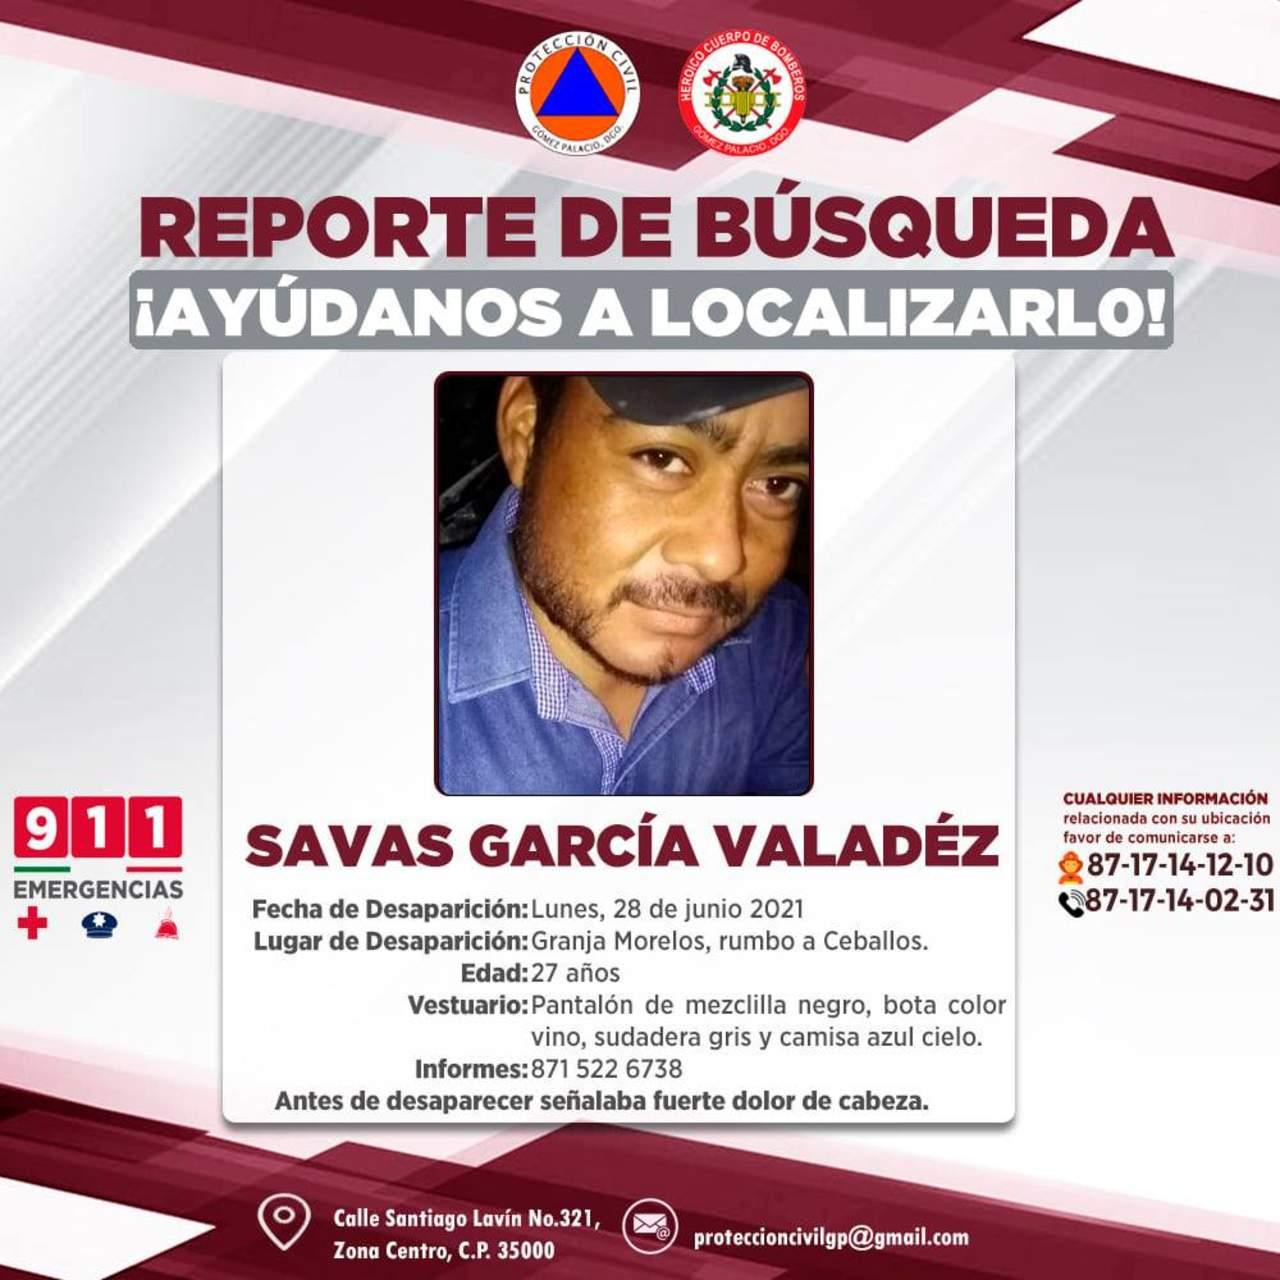 Solicitan ayuda para localizar a joven desaparecido en Durango